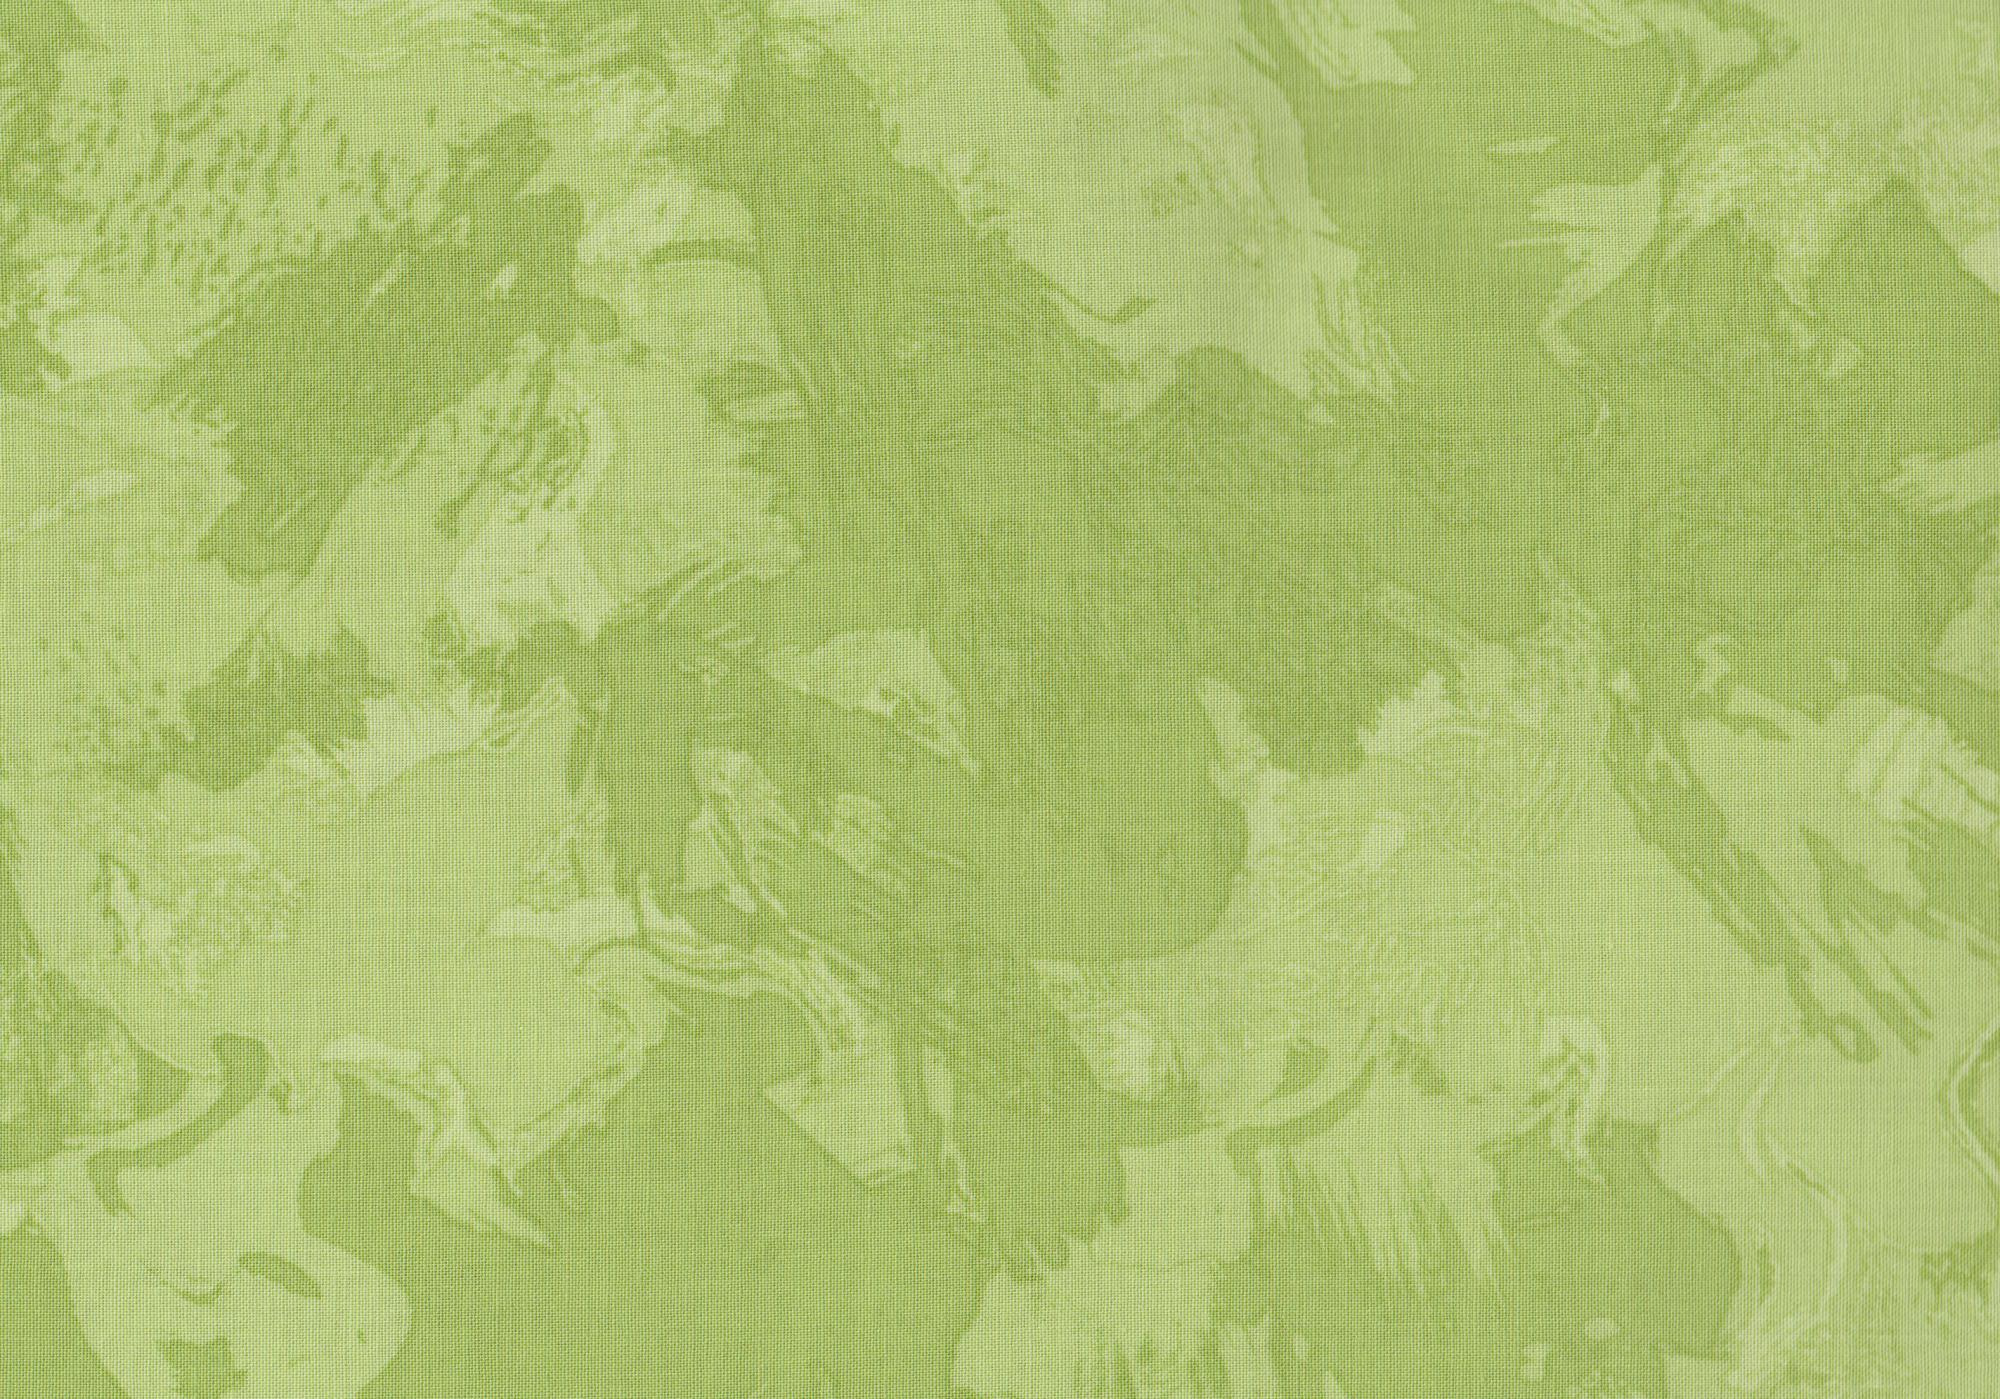 PROMO* Boundless - Blenders Collage Prints #7 Green Tonal